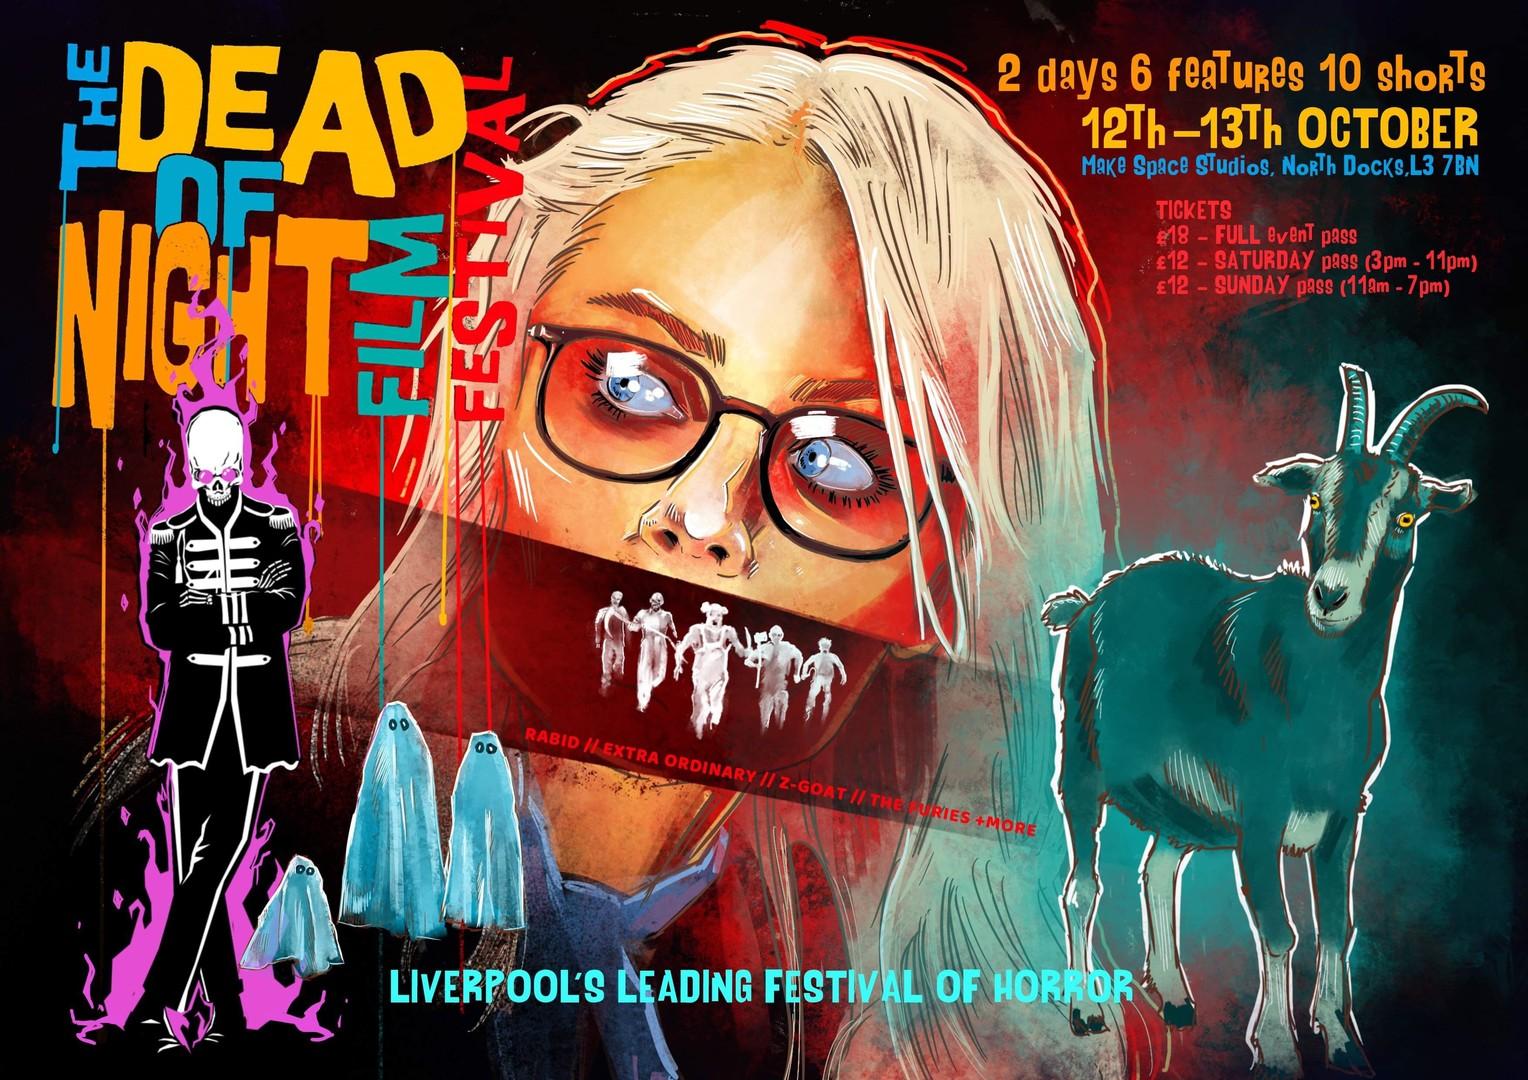 The Dead of Night Film Festival (Sunday 13th October 2019)